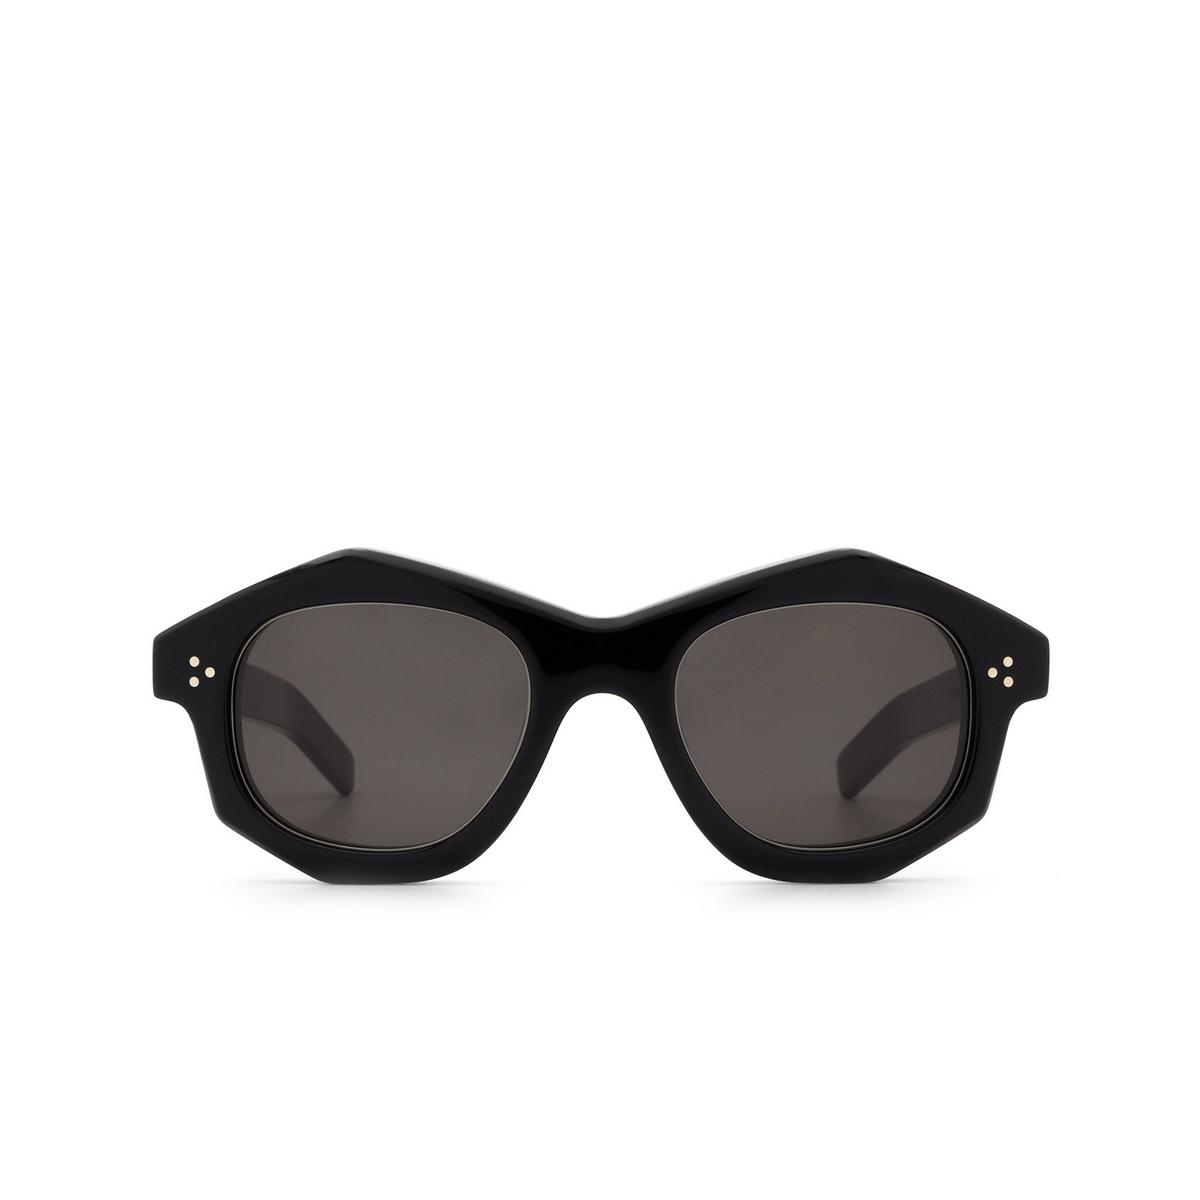 Lesca® Irregular Sunglasses: Dada Sun color Black 5 - front view.